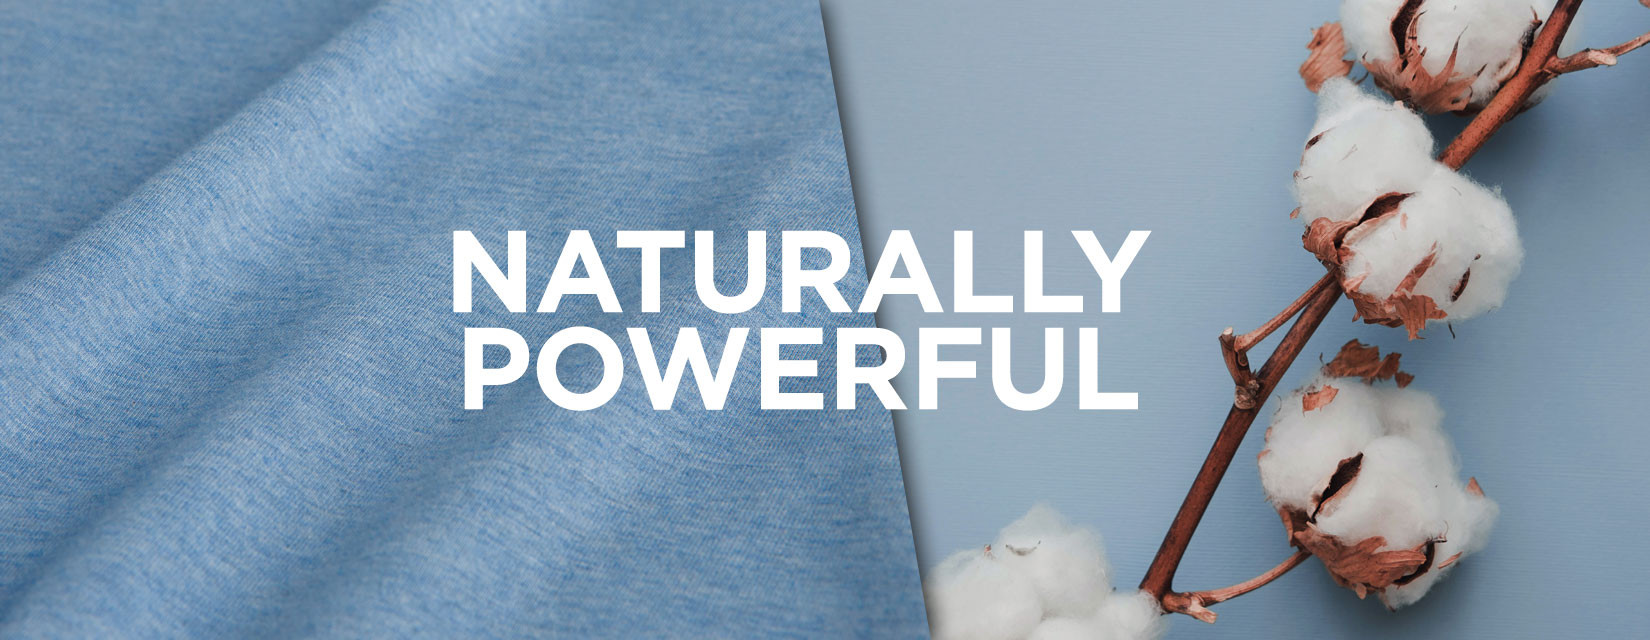 Naturally powerful